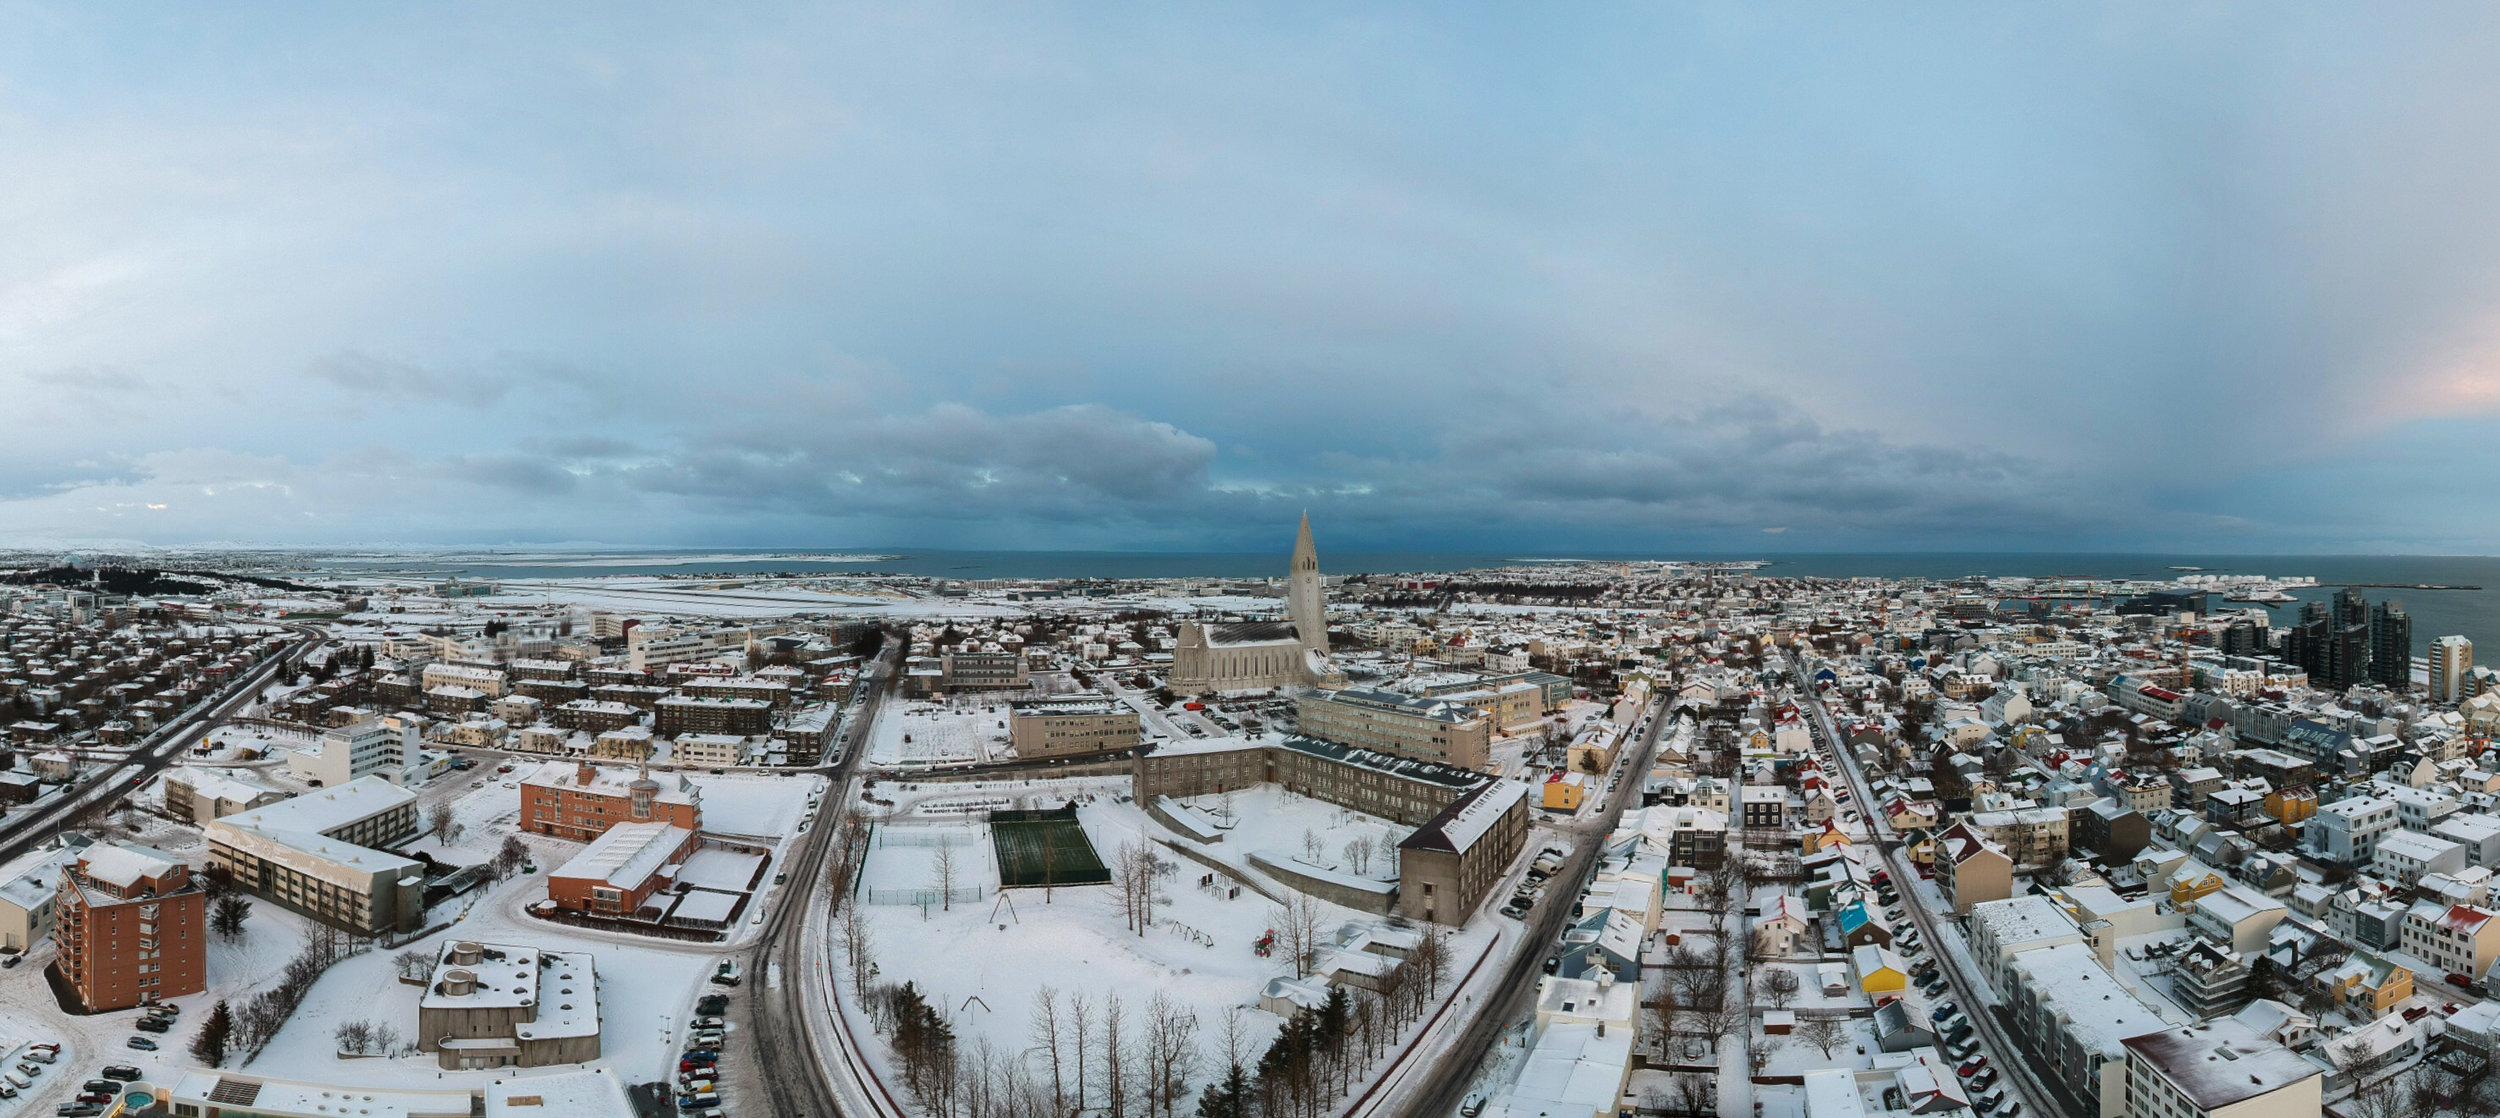 Iceland 2018 - Drone Pano-0081.jpg